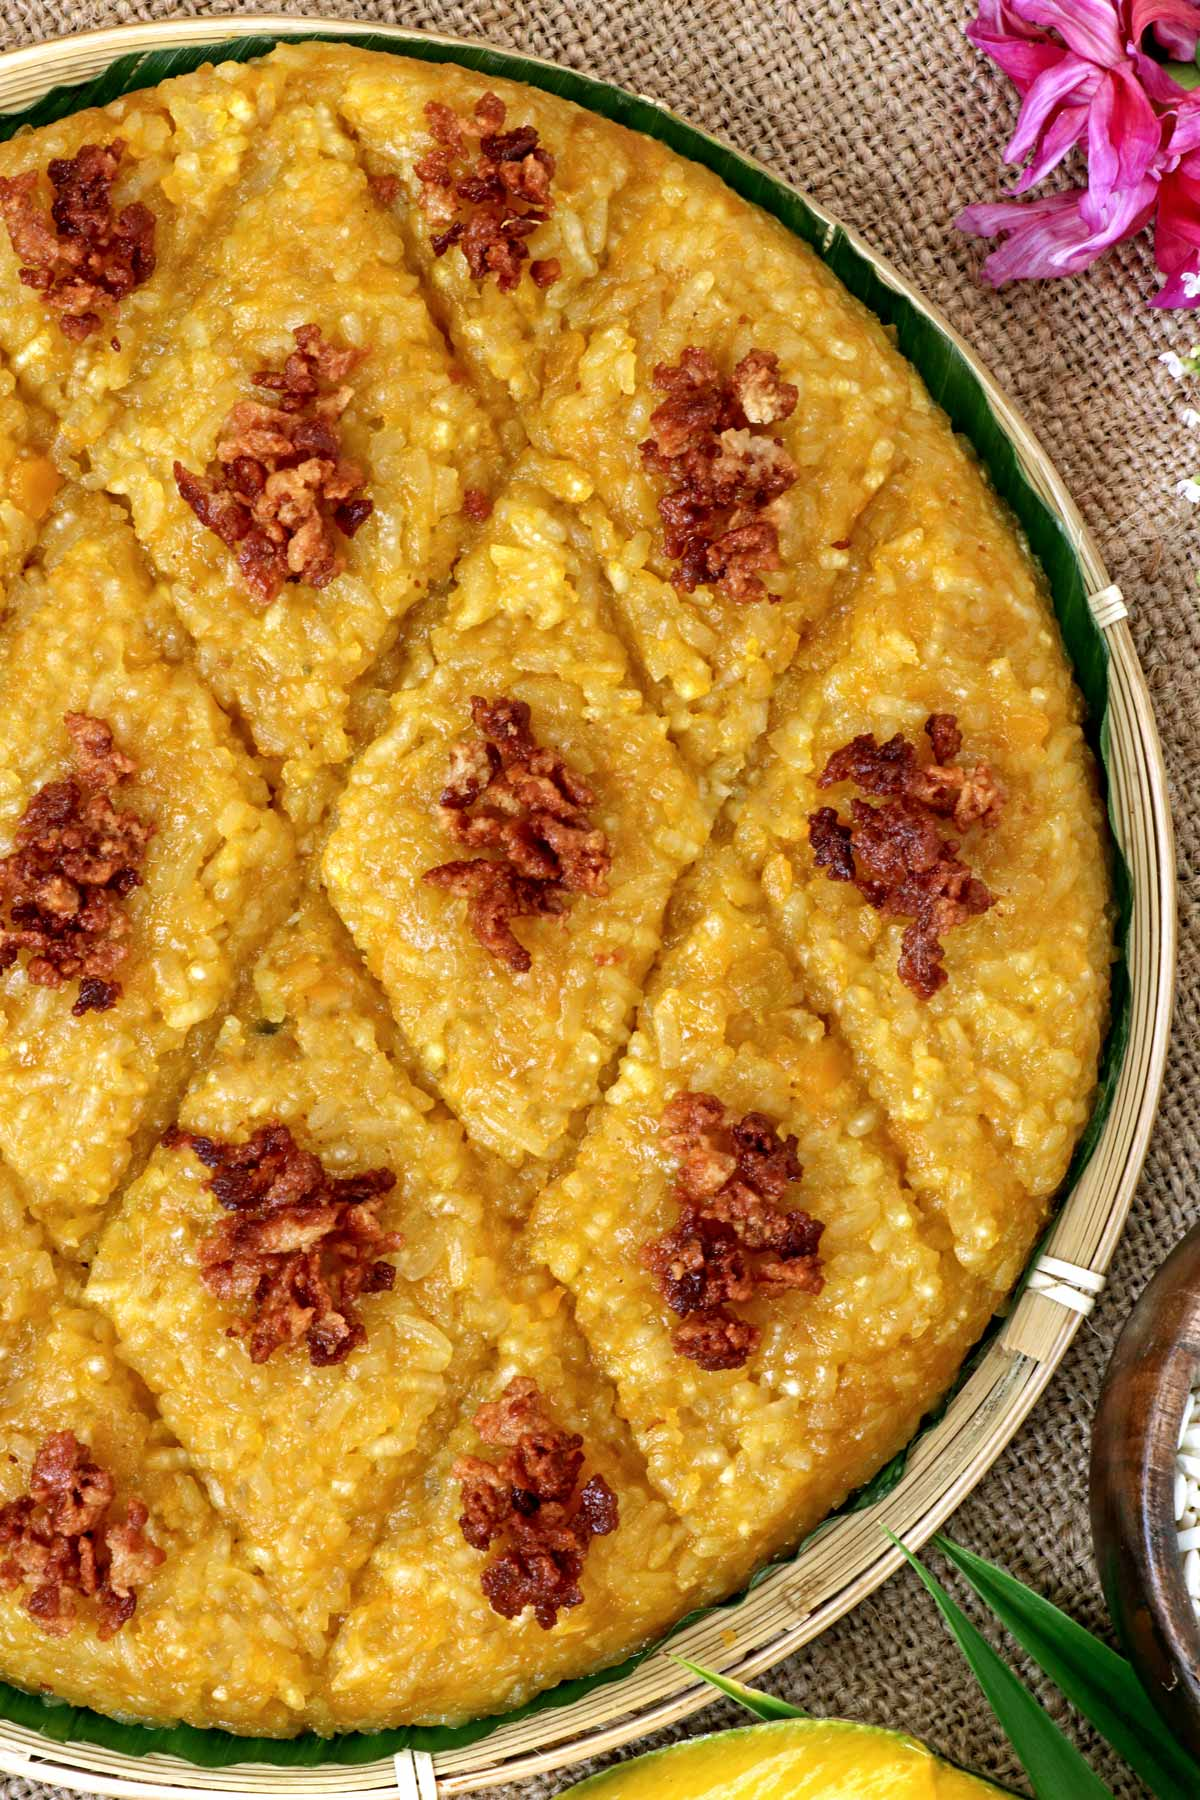 Biko Kalabasa - a glutinous rice cake with squash.